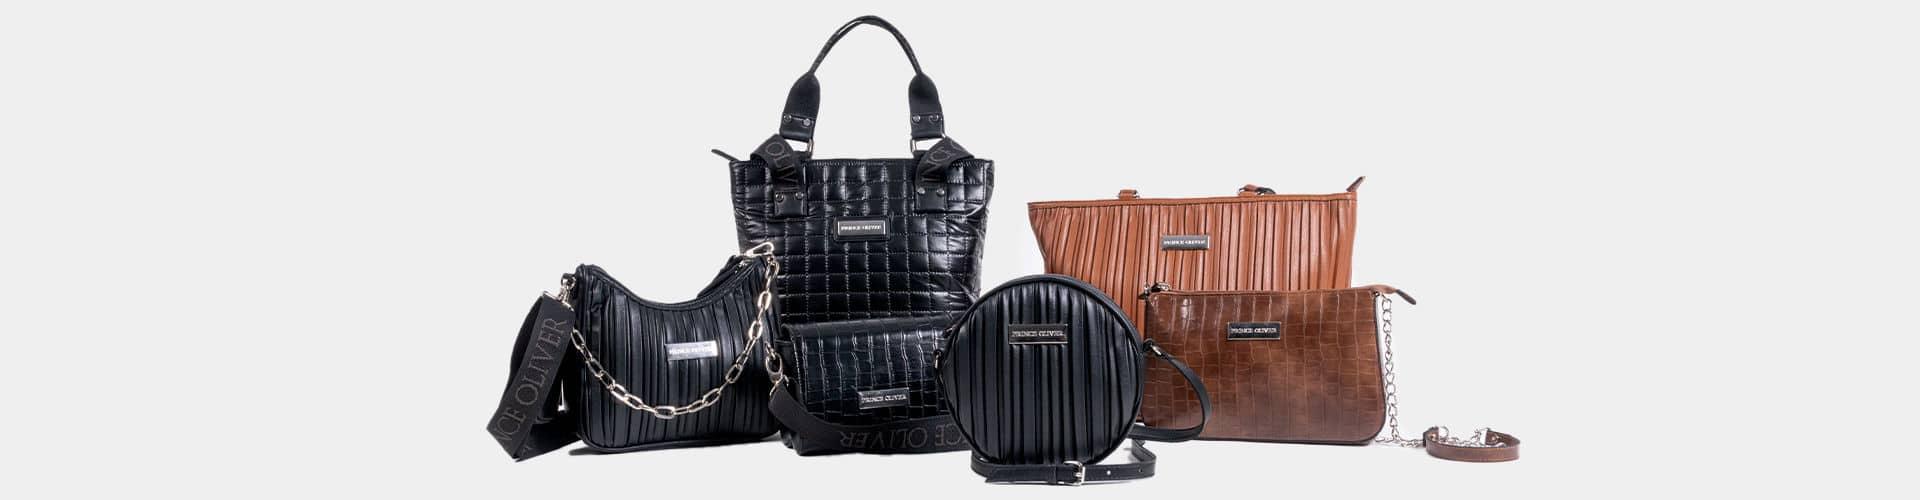 1920x500_bags